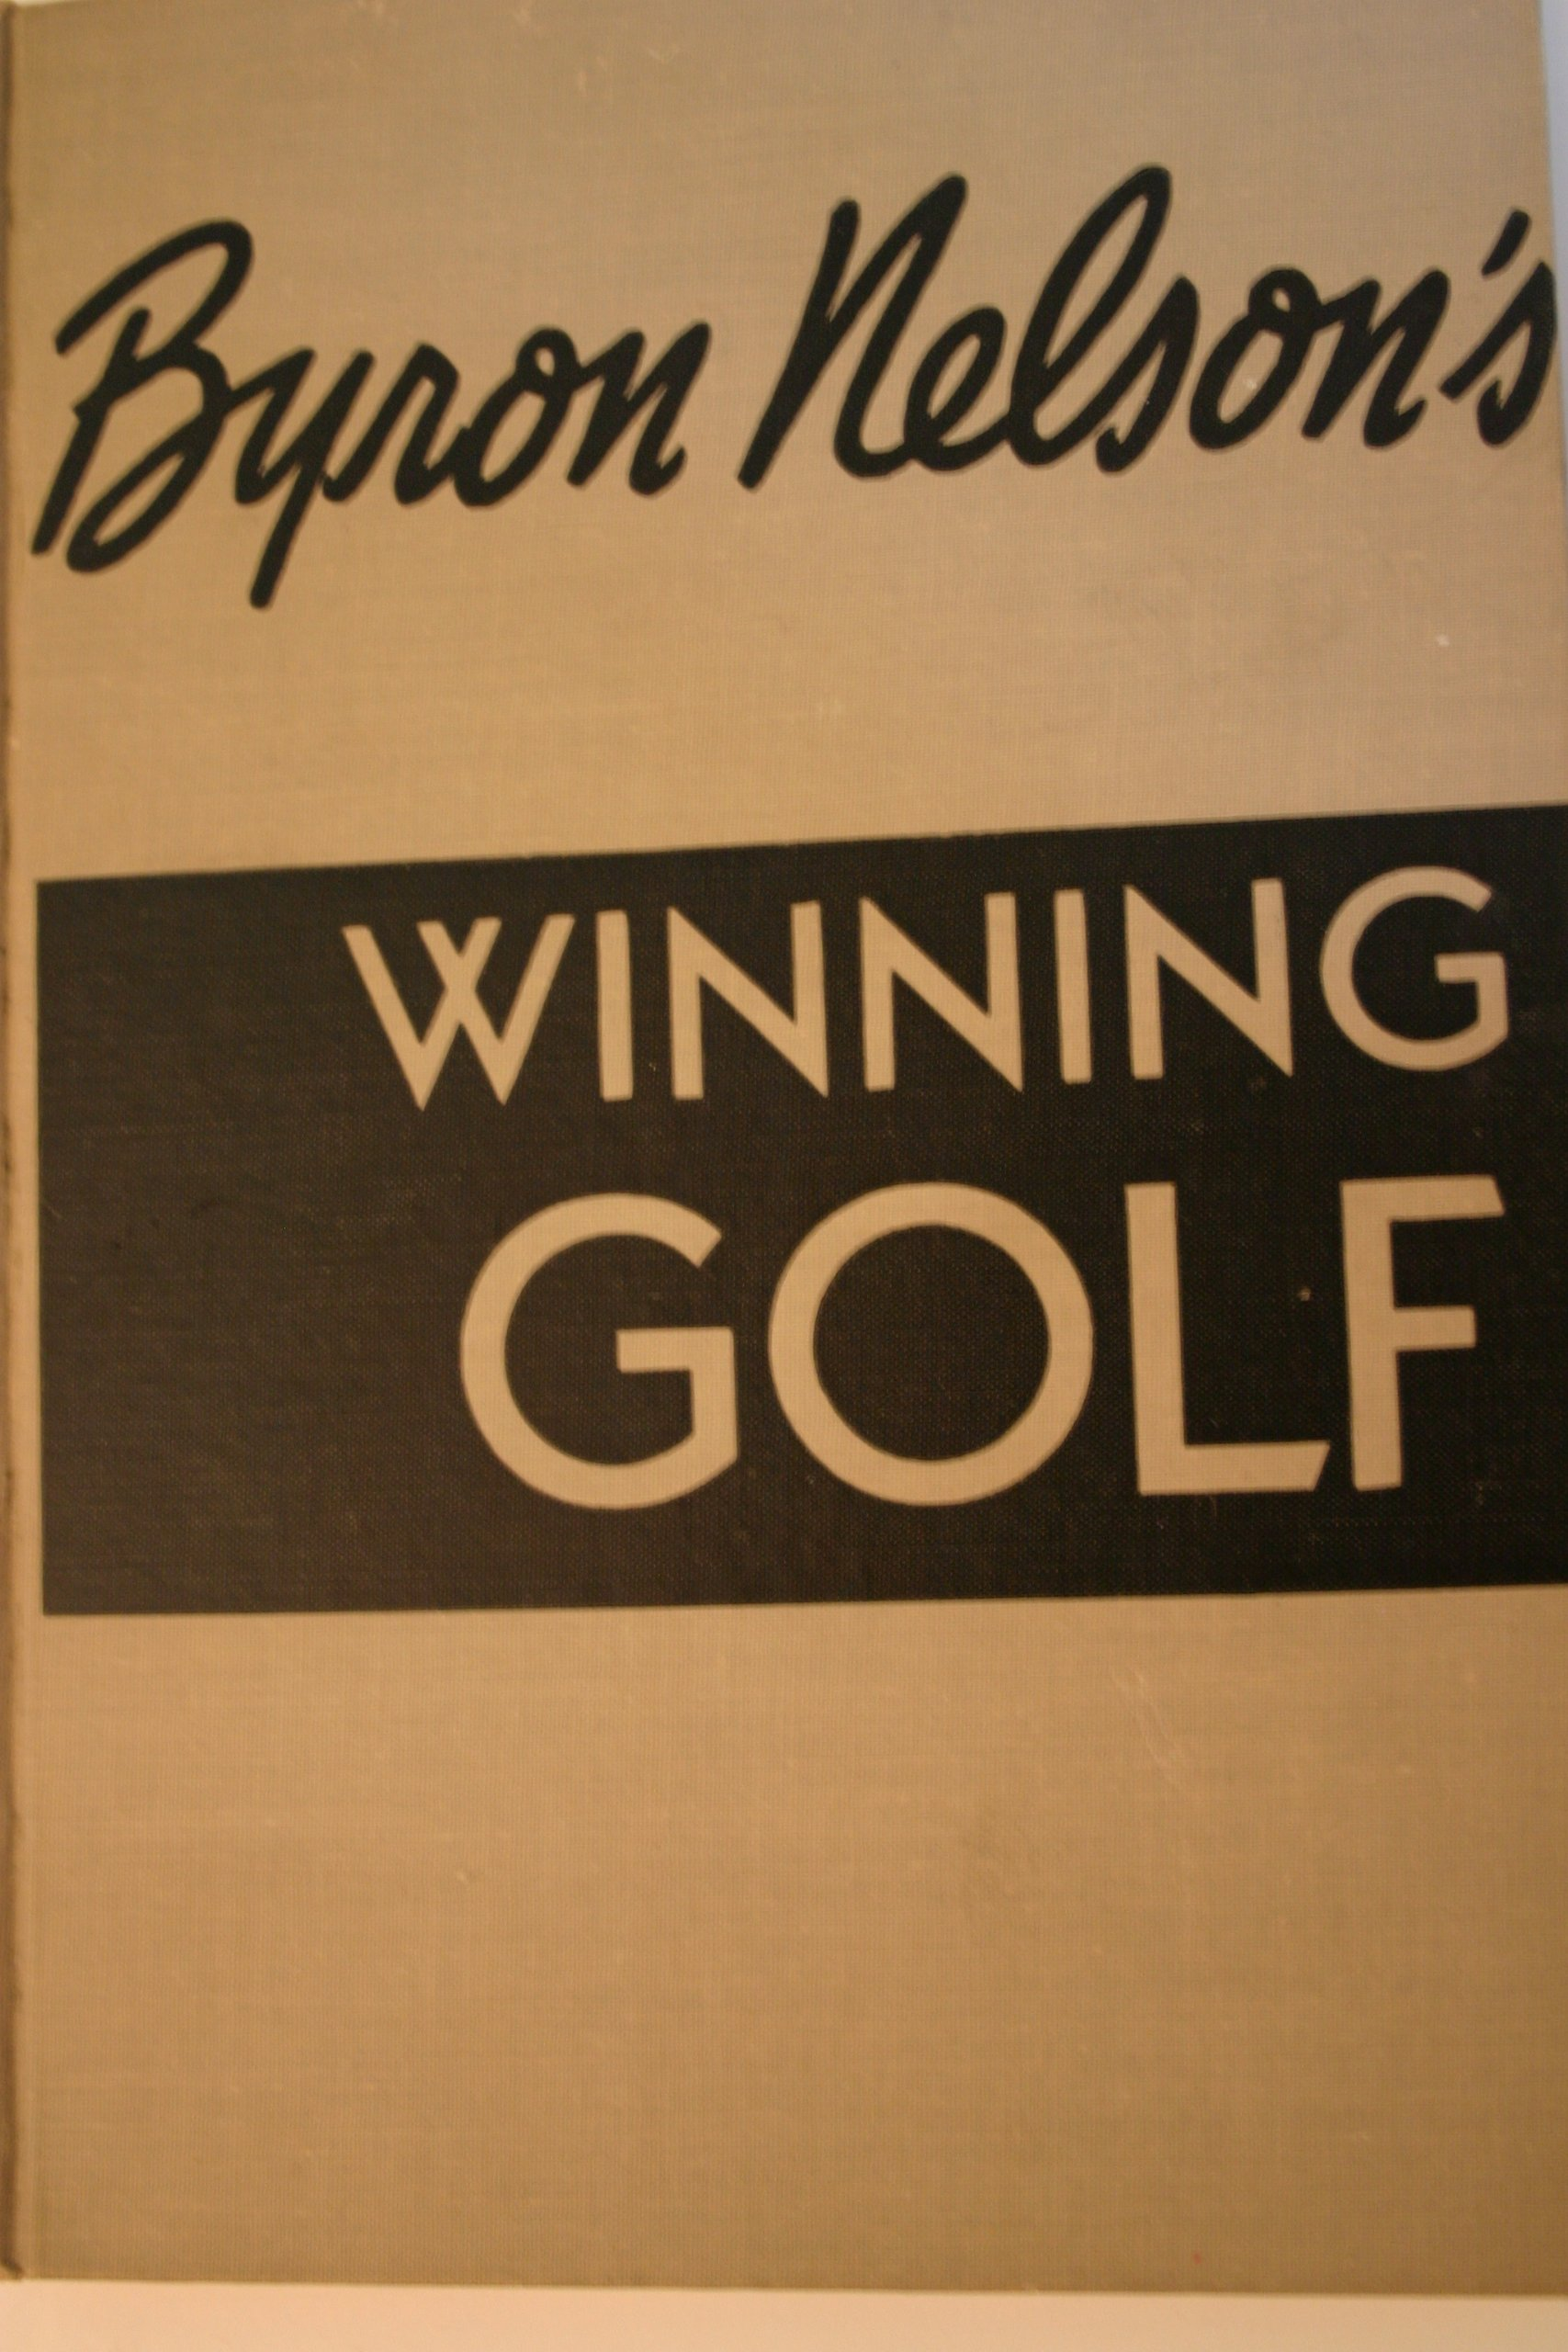 Byron Nelson's Winning Golf